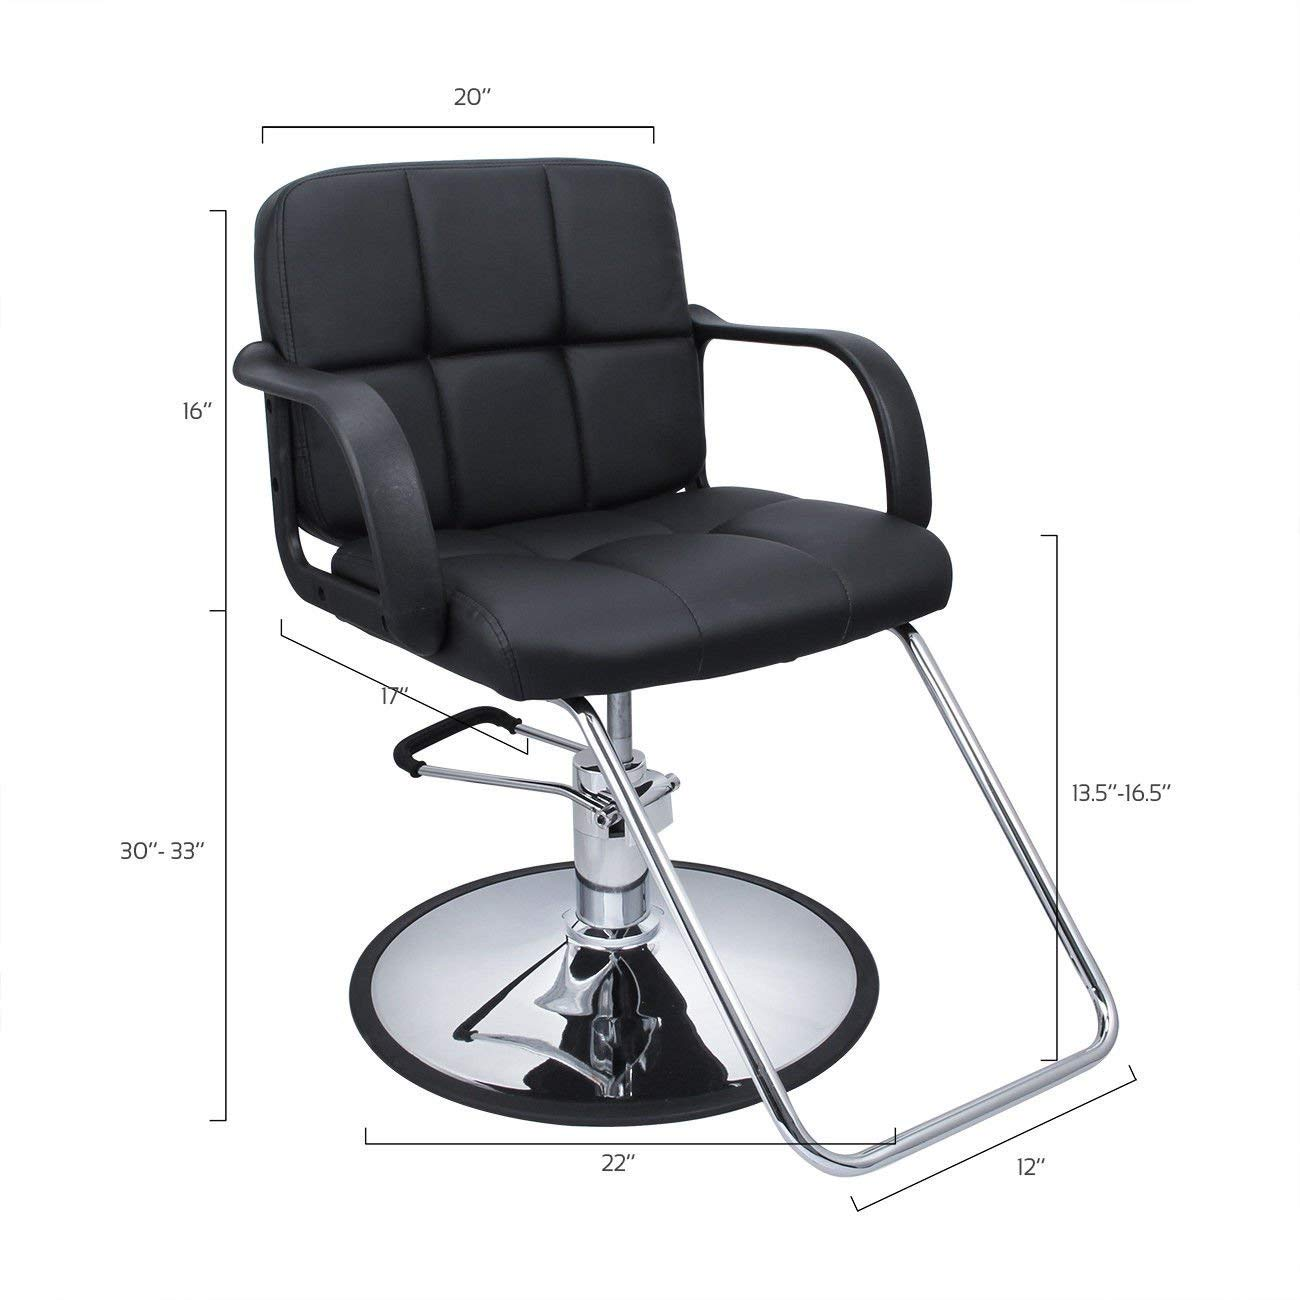 nooshi Cutting Hair Cape w/Hydraulic Barber Chair Salon Beauty Spa Styling Black Seat